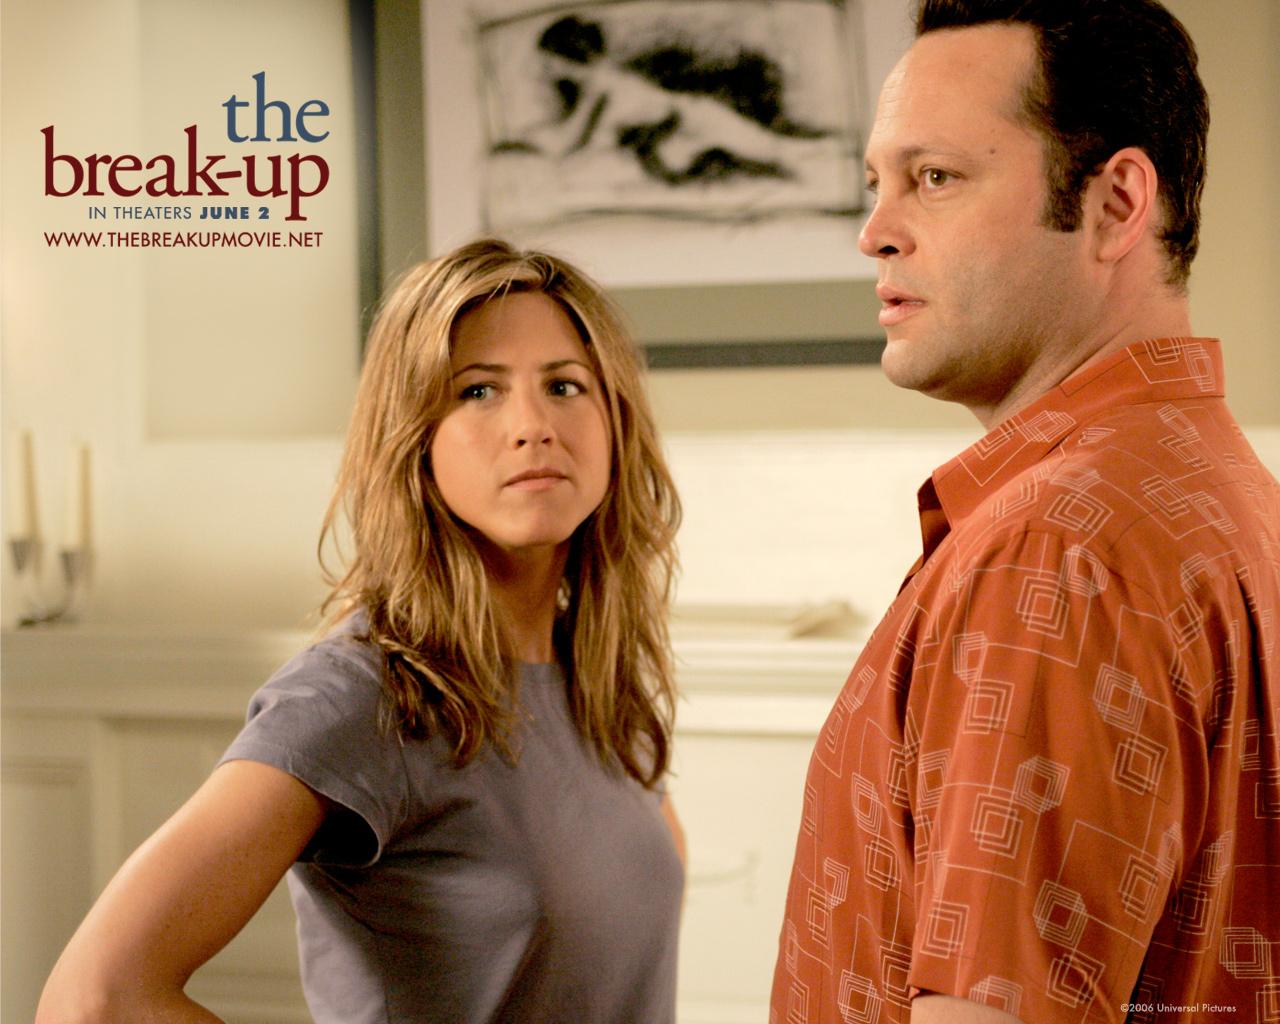 Jennifer aniston naked in the break up